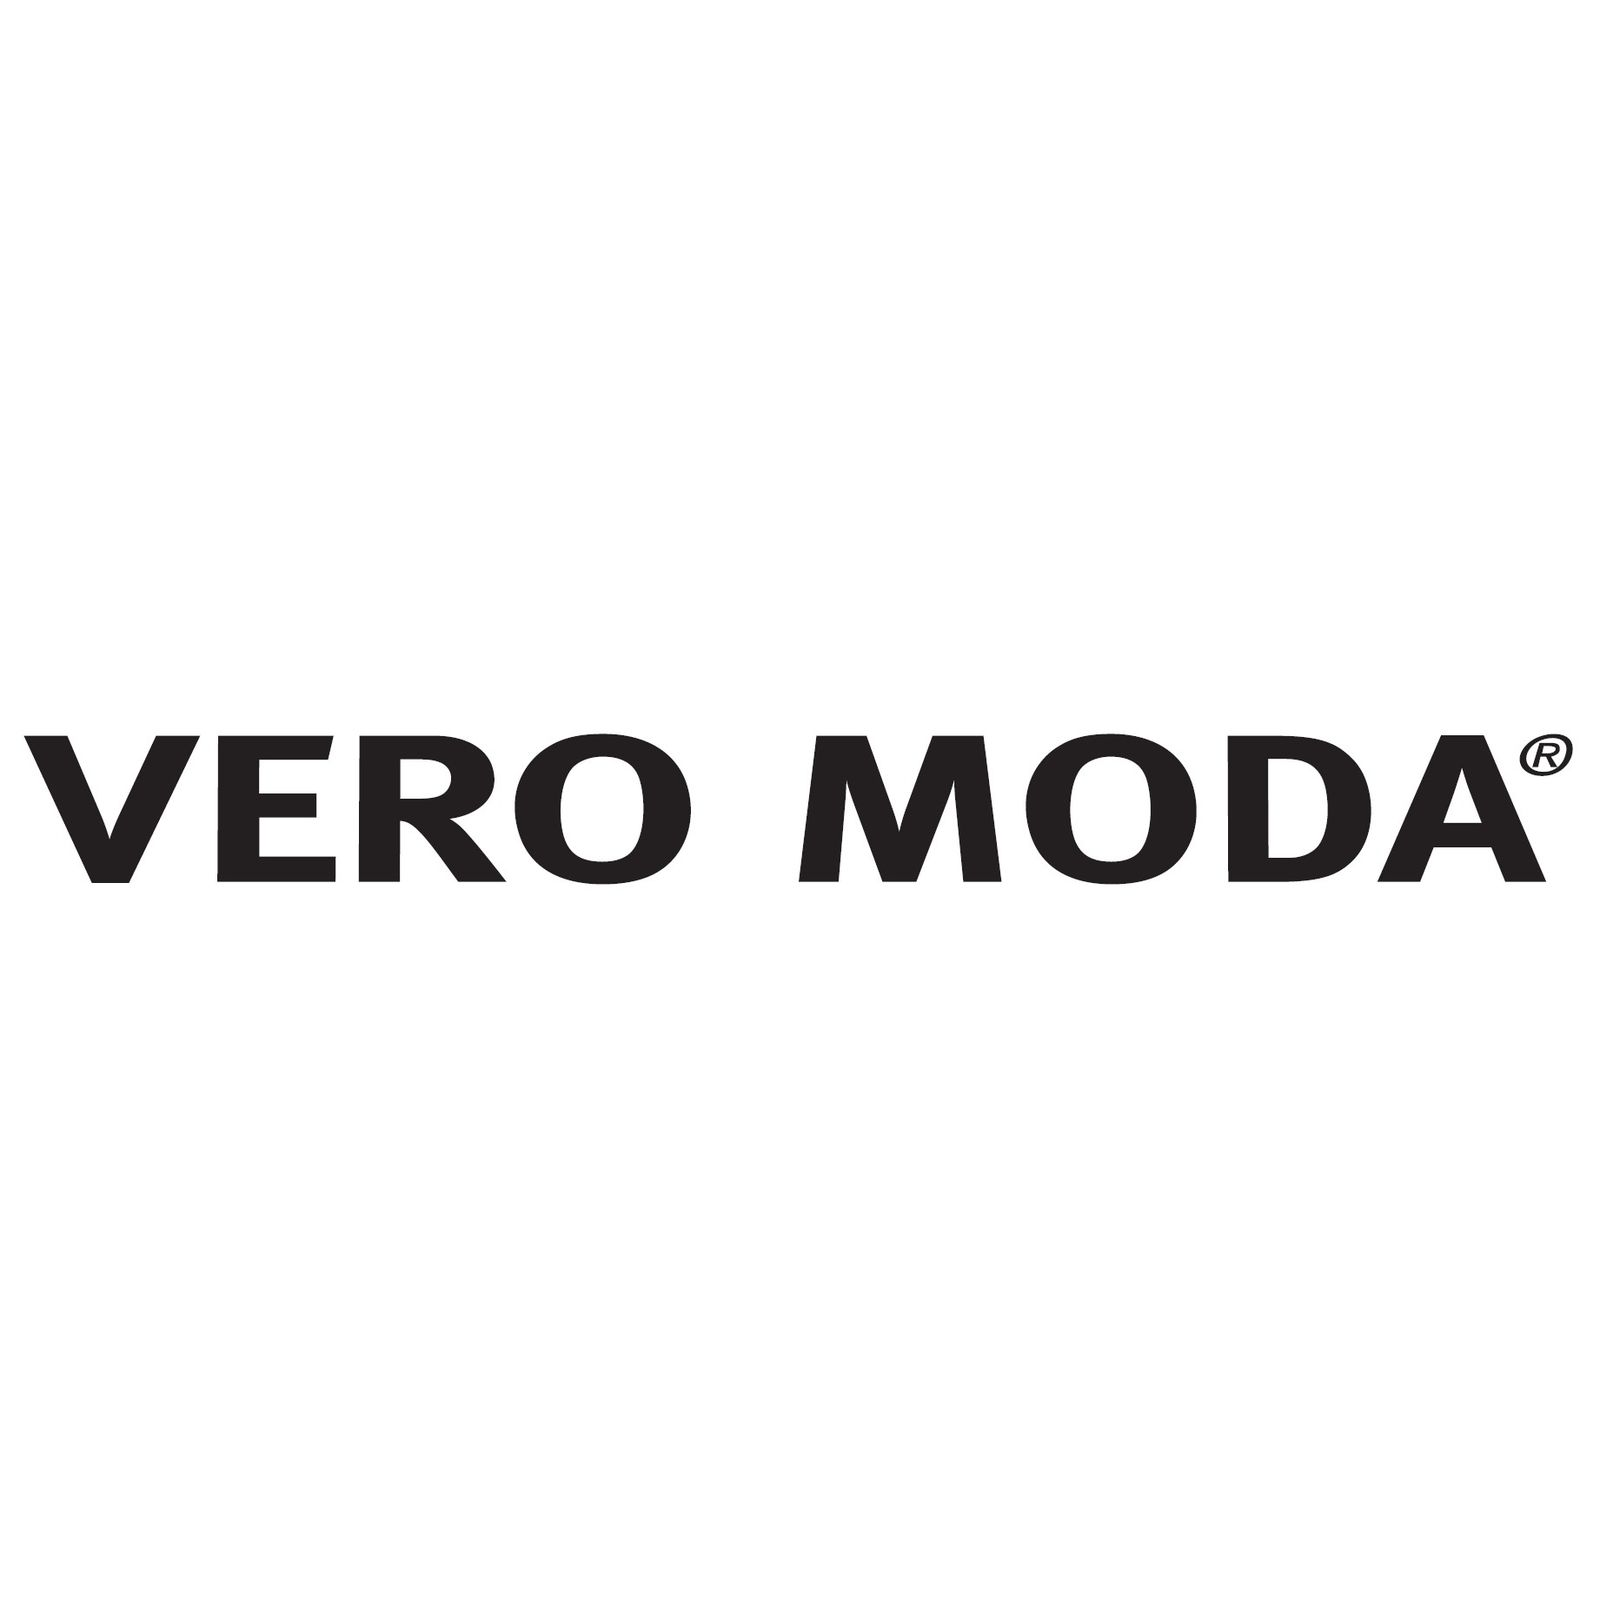 VERO MODA (Bild 1)